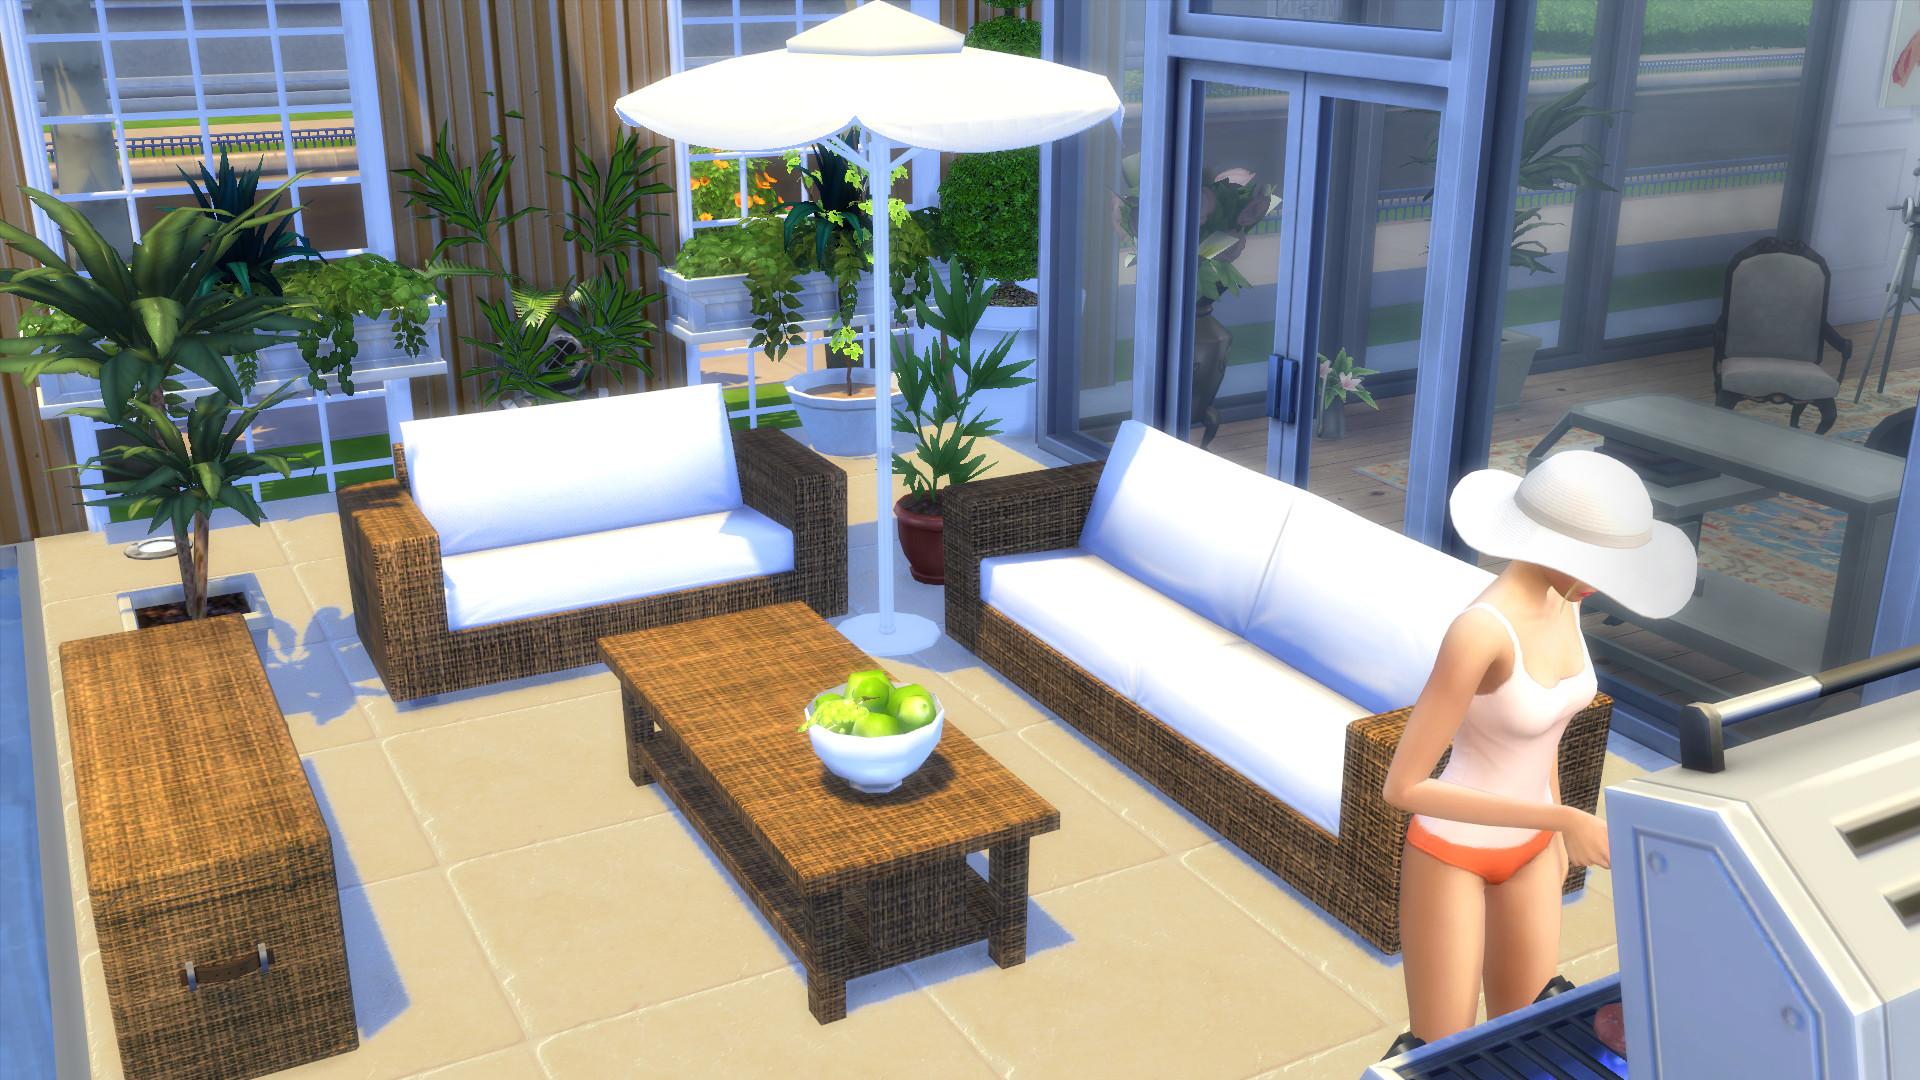 Mod The Sims  Garden Furnitures  Set